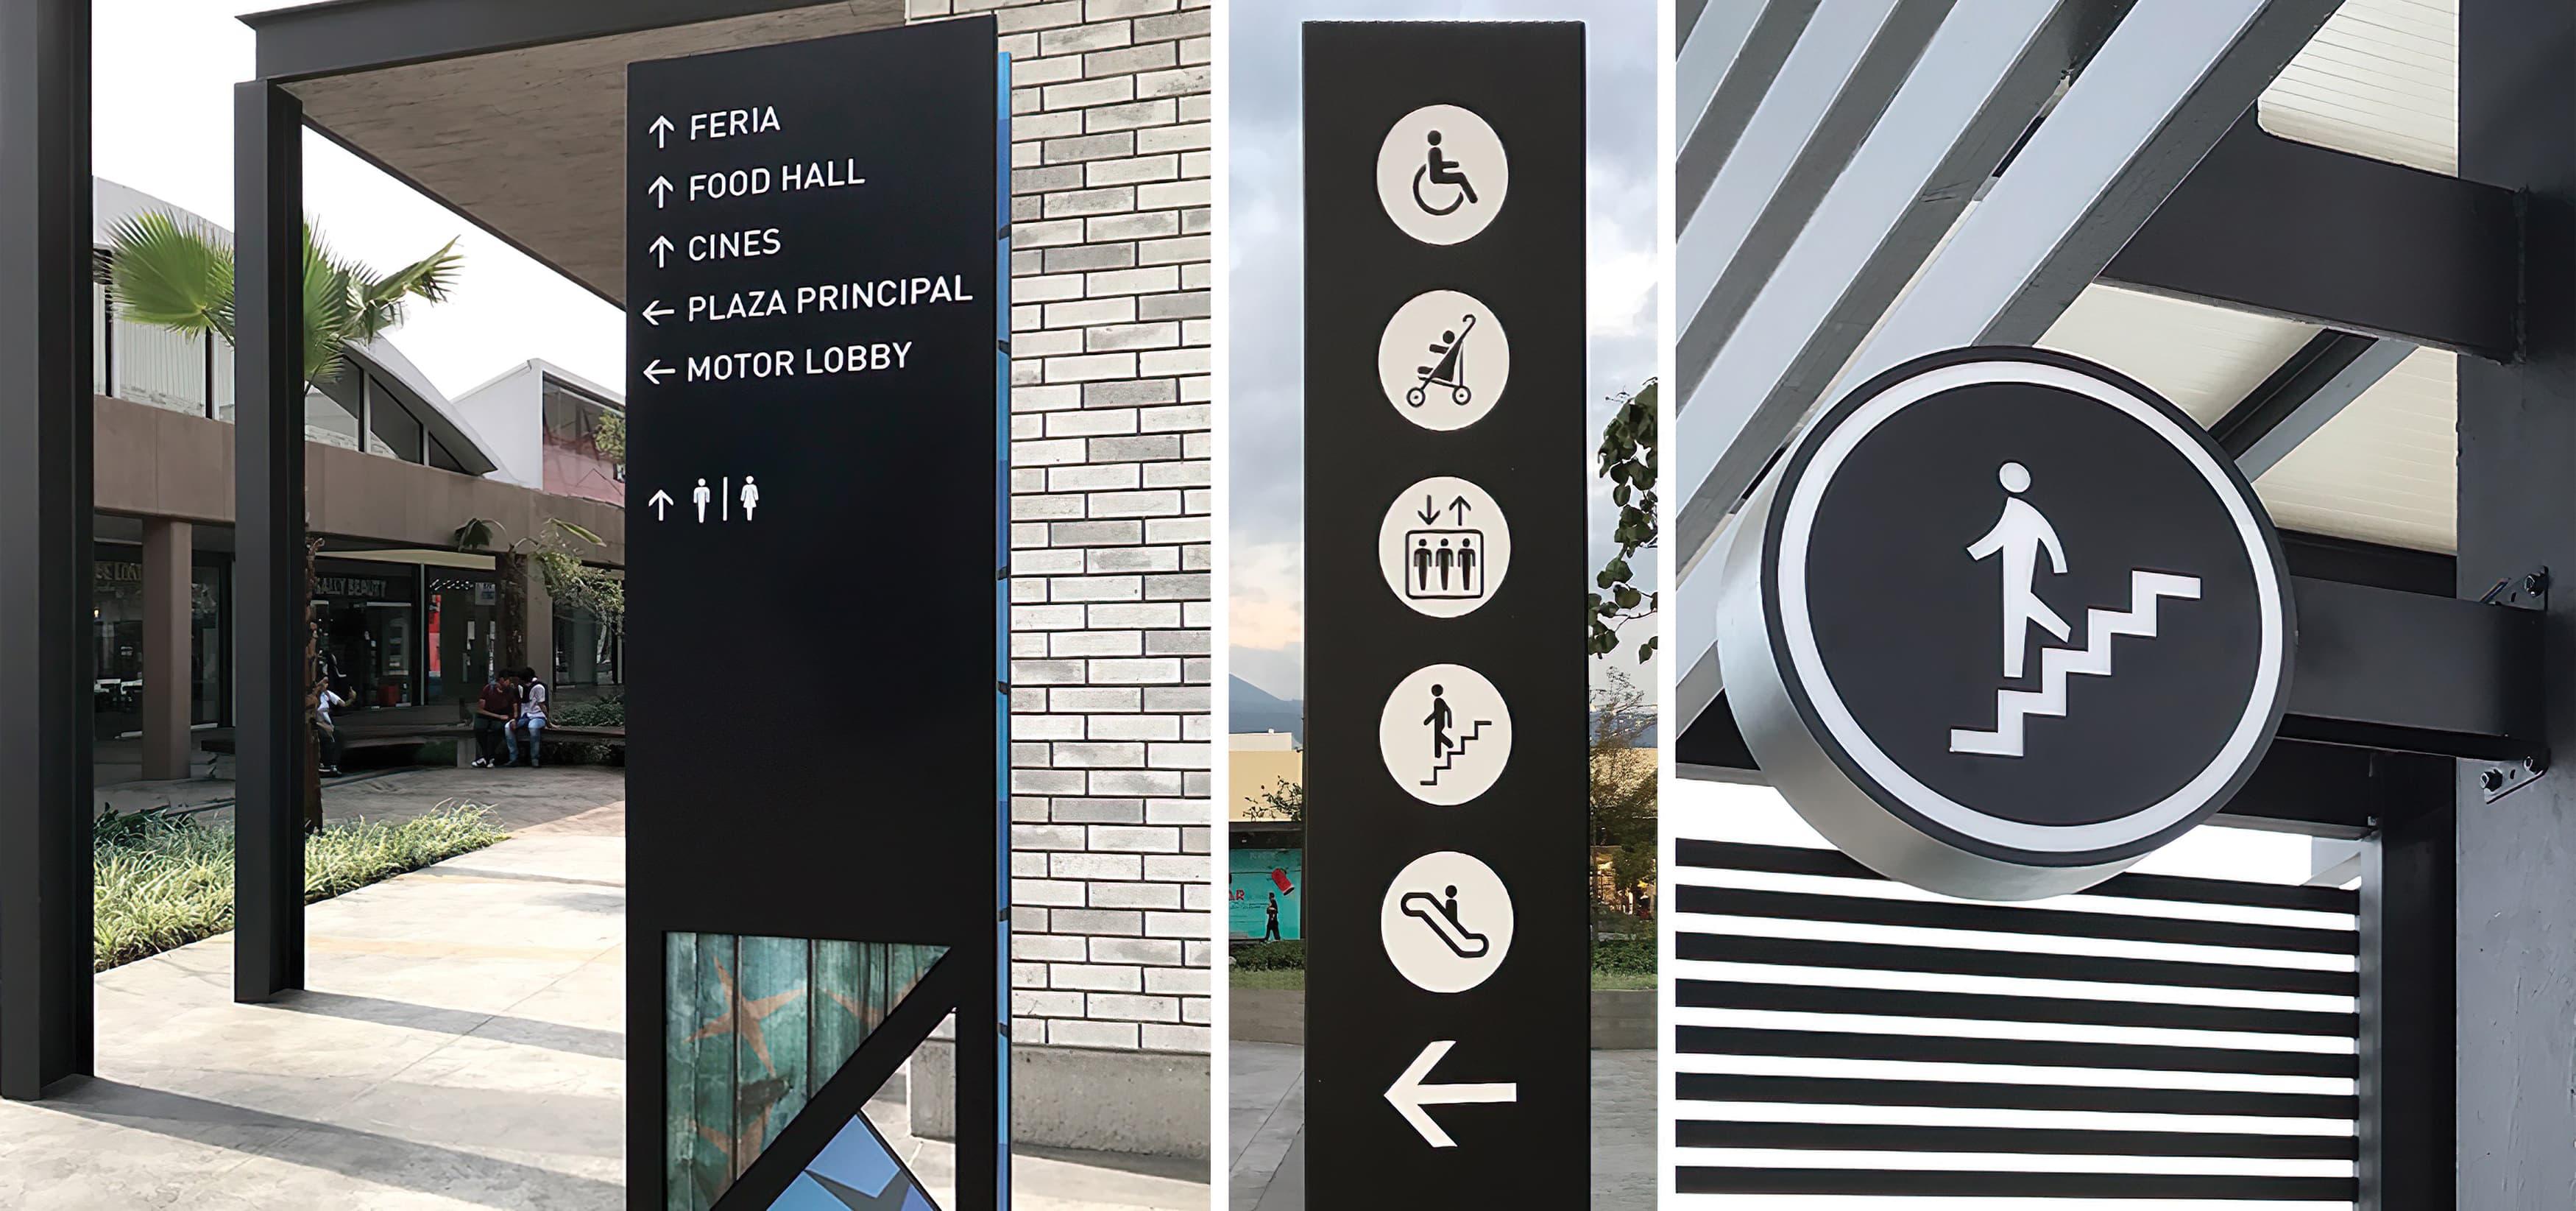 Forum Cuernavaca, a retail and mixed-use project in Cuernavaca, Mexico, pedestrian wayfinding design and icons